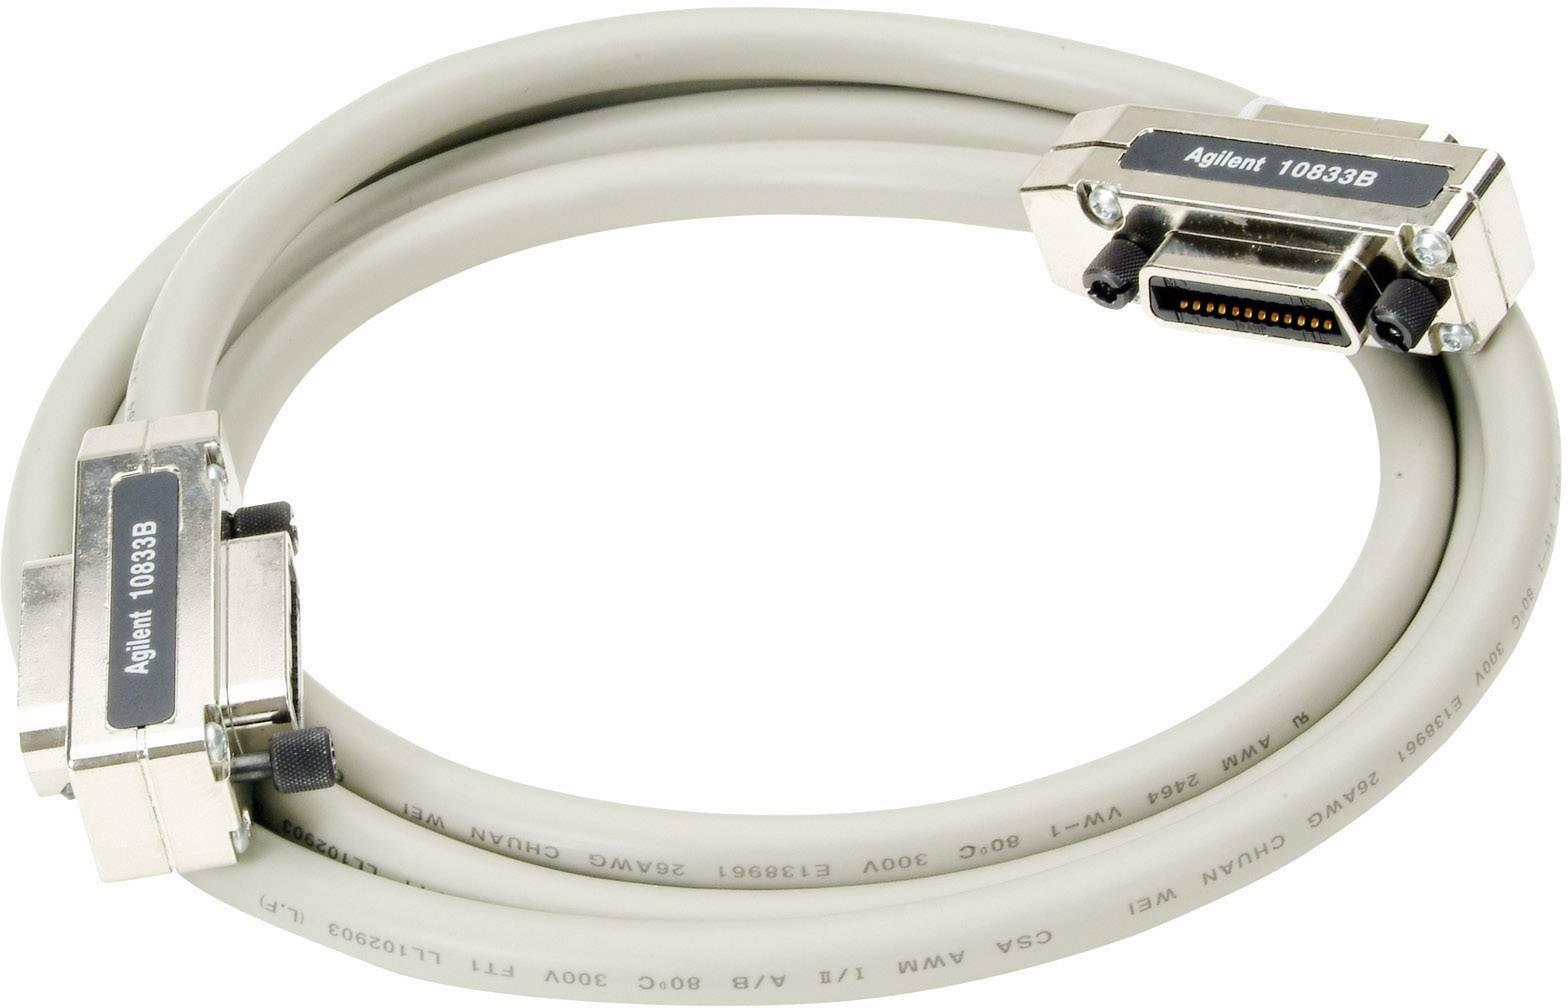 Kábel Agilent Technologies 10833, 1 m